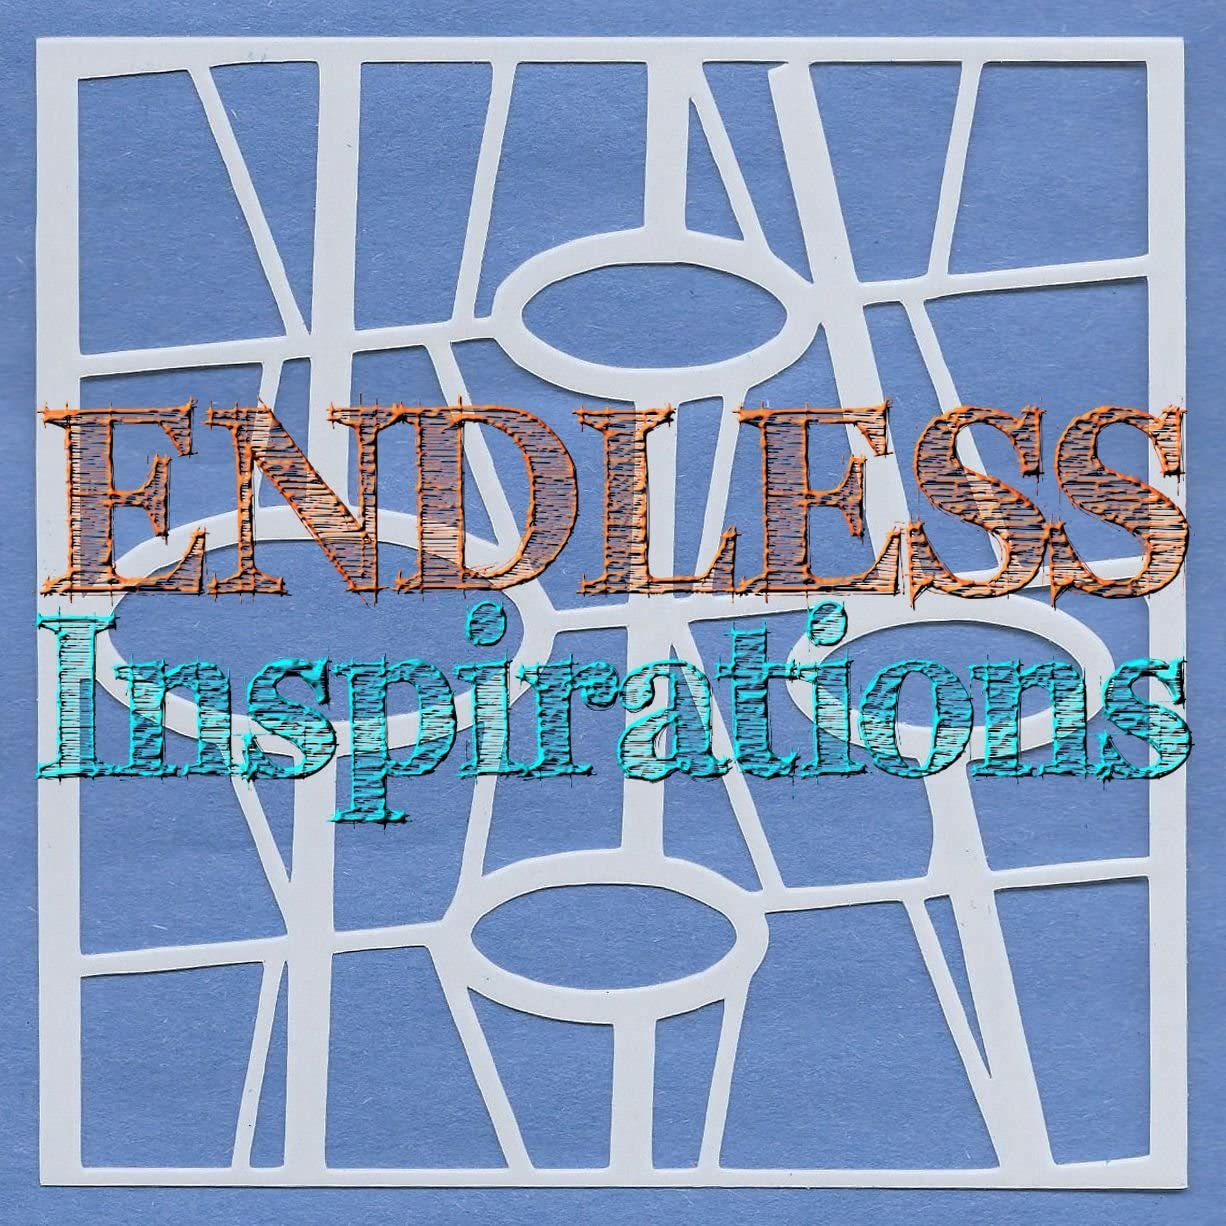 Redbird Inspirations Original Stencil, 6x6 Inch, 50s Abstract